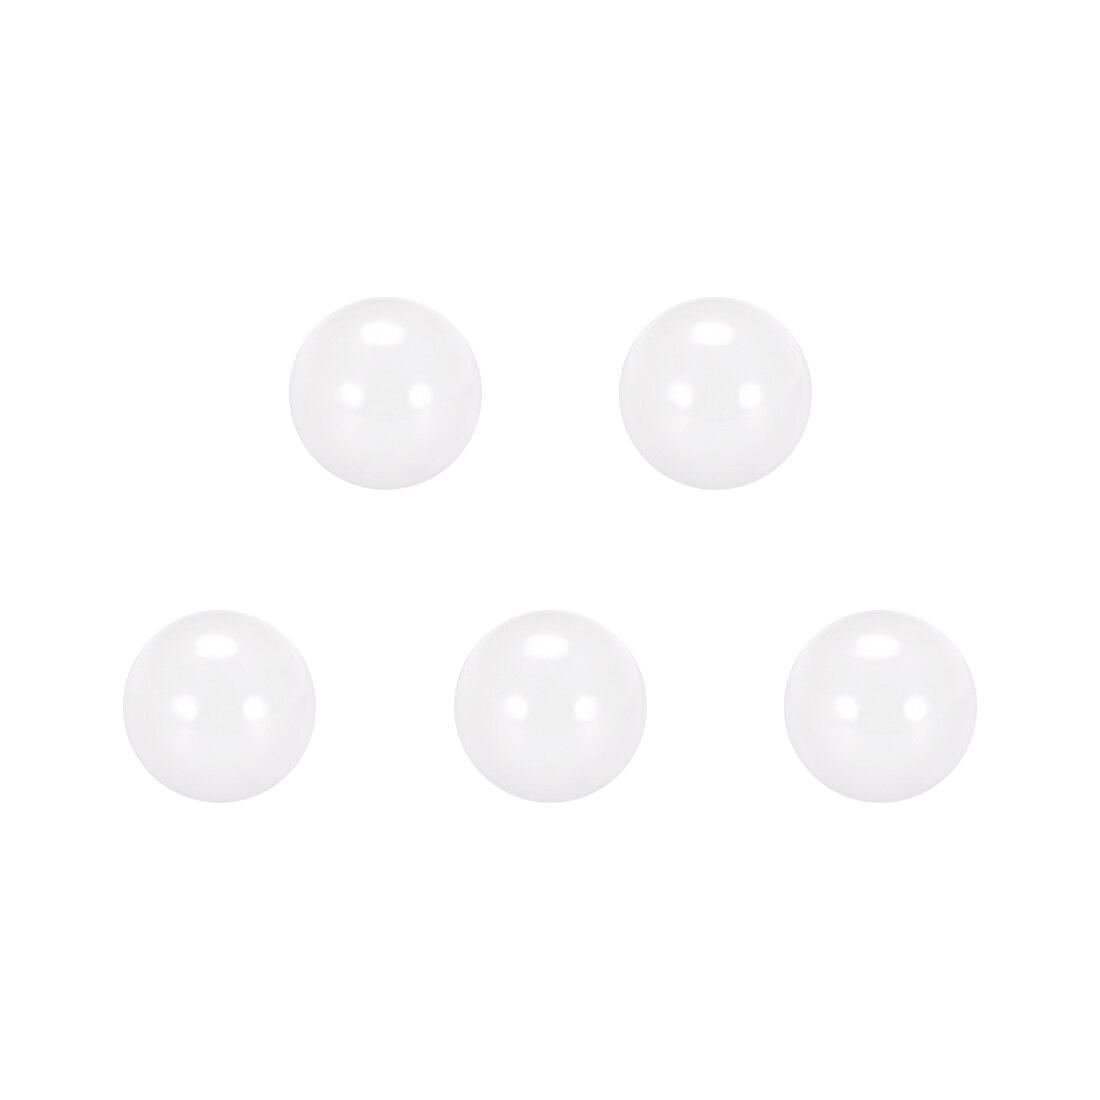 Uxcell 2.5mm Ceramic Bearing Balls, ZrO2 Zirconium Oxide Ball G5 Precision 5pcs